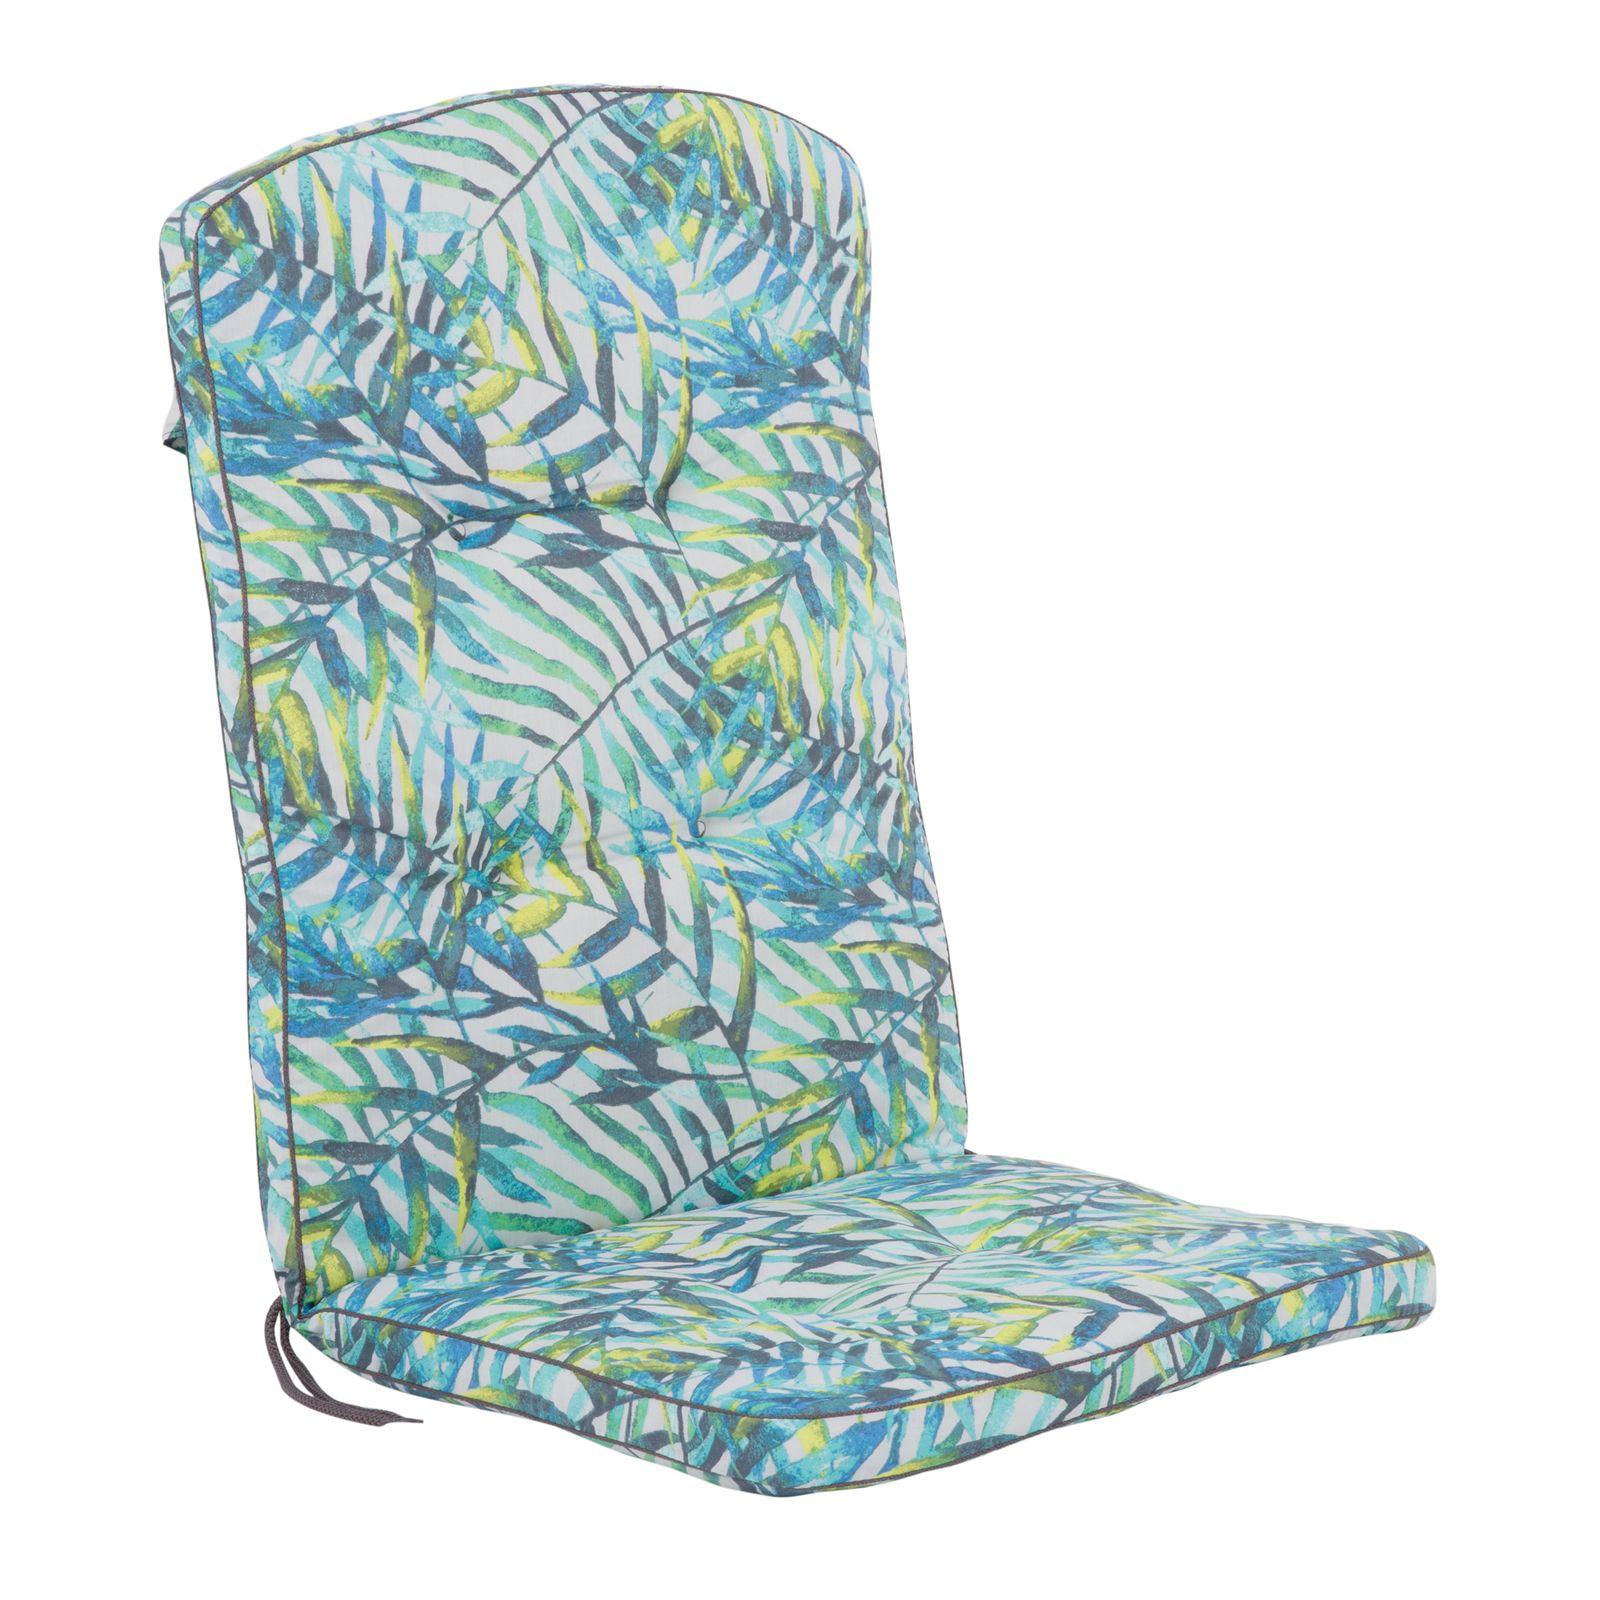 Poduszka na krzesło Szafir G045-01PB PATIO